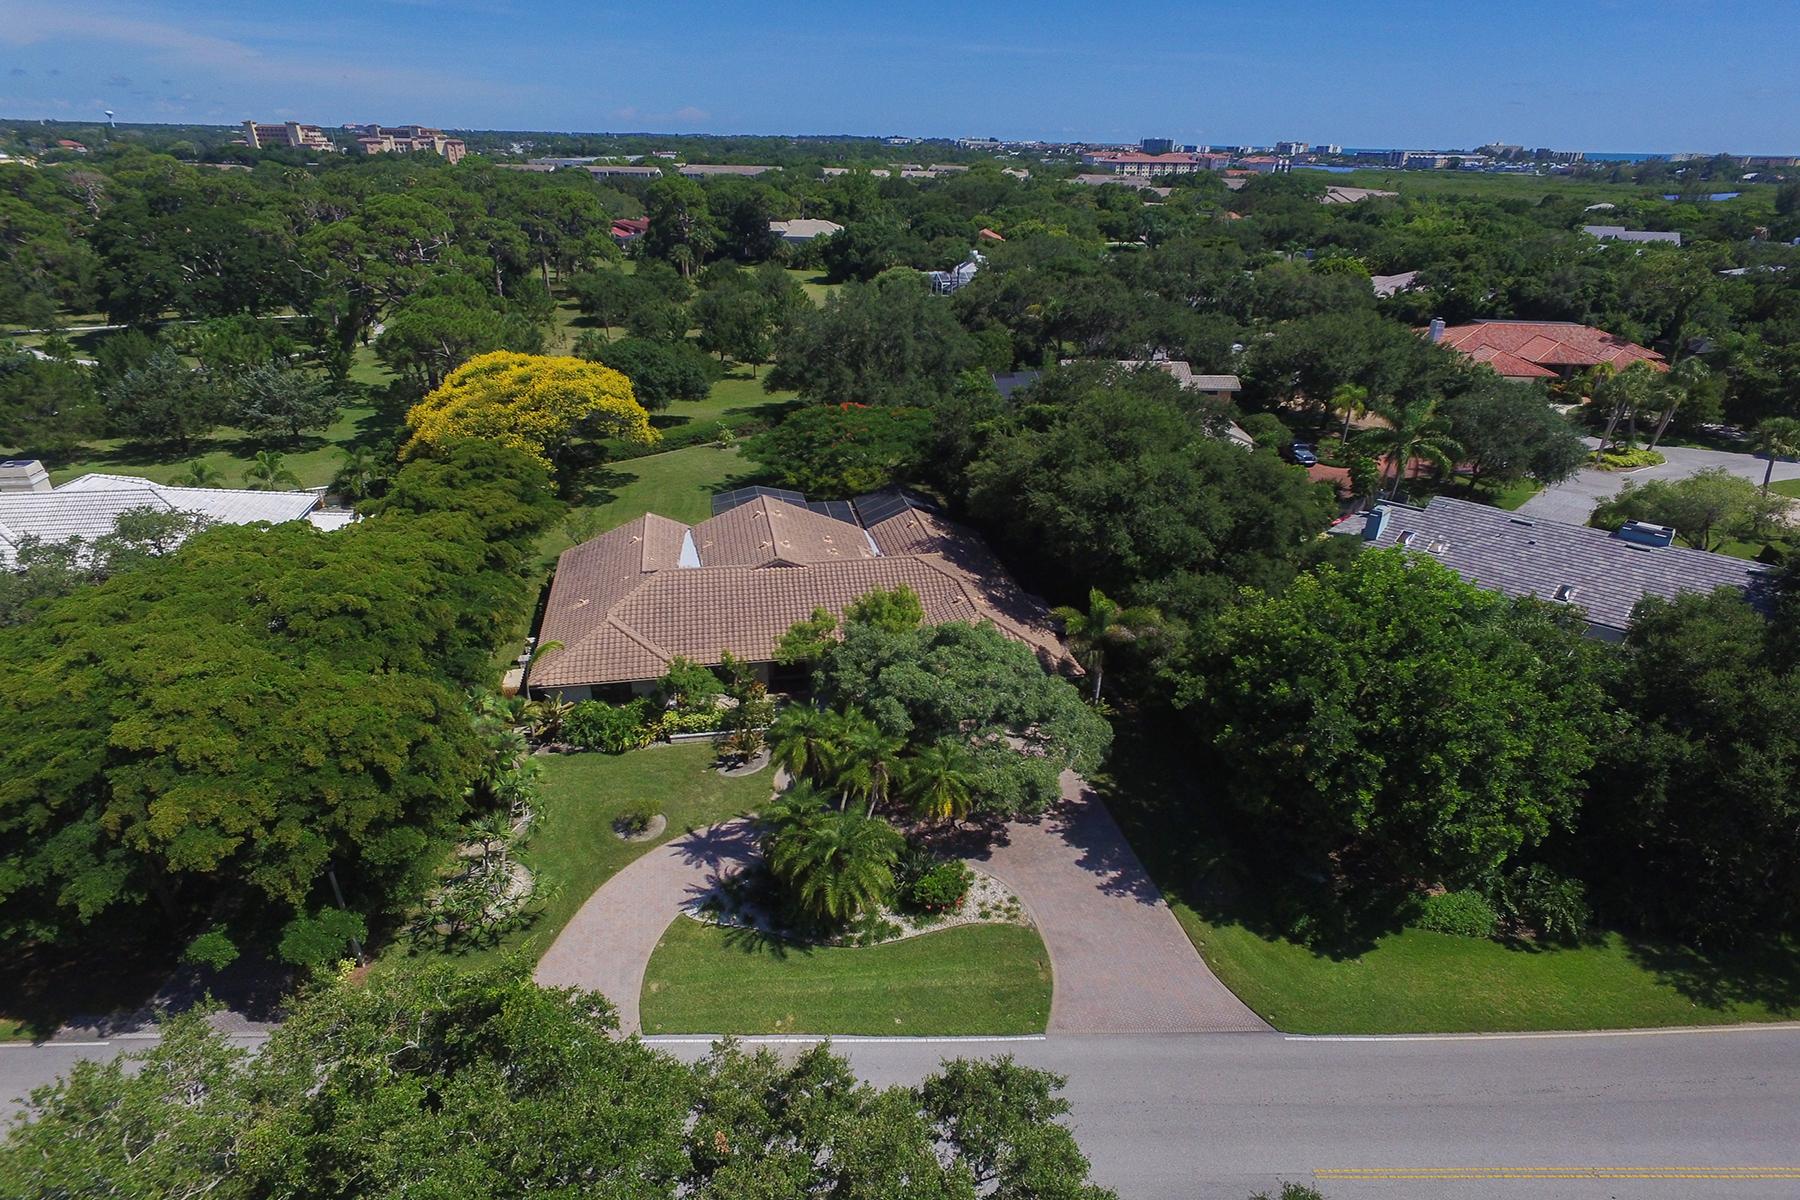 Casa Unifamiliar por un Venta en THE LANDINGS 1650 Landings Blvd Sarasota, Florida, 34231 Estados Unidos